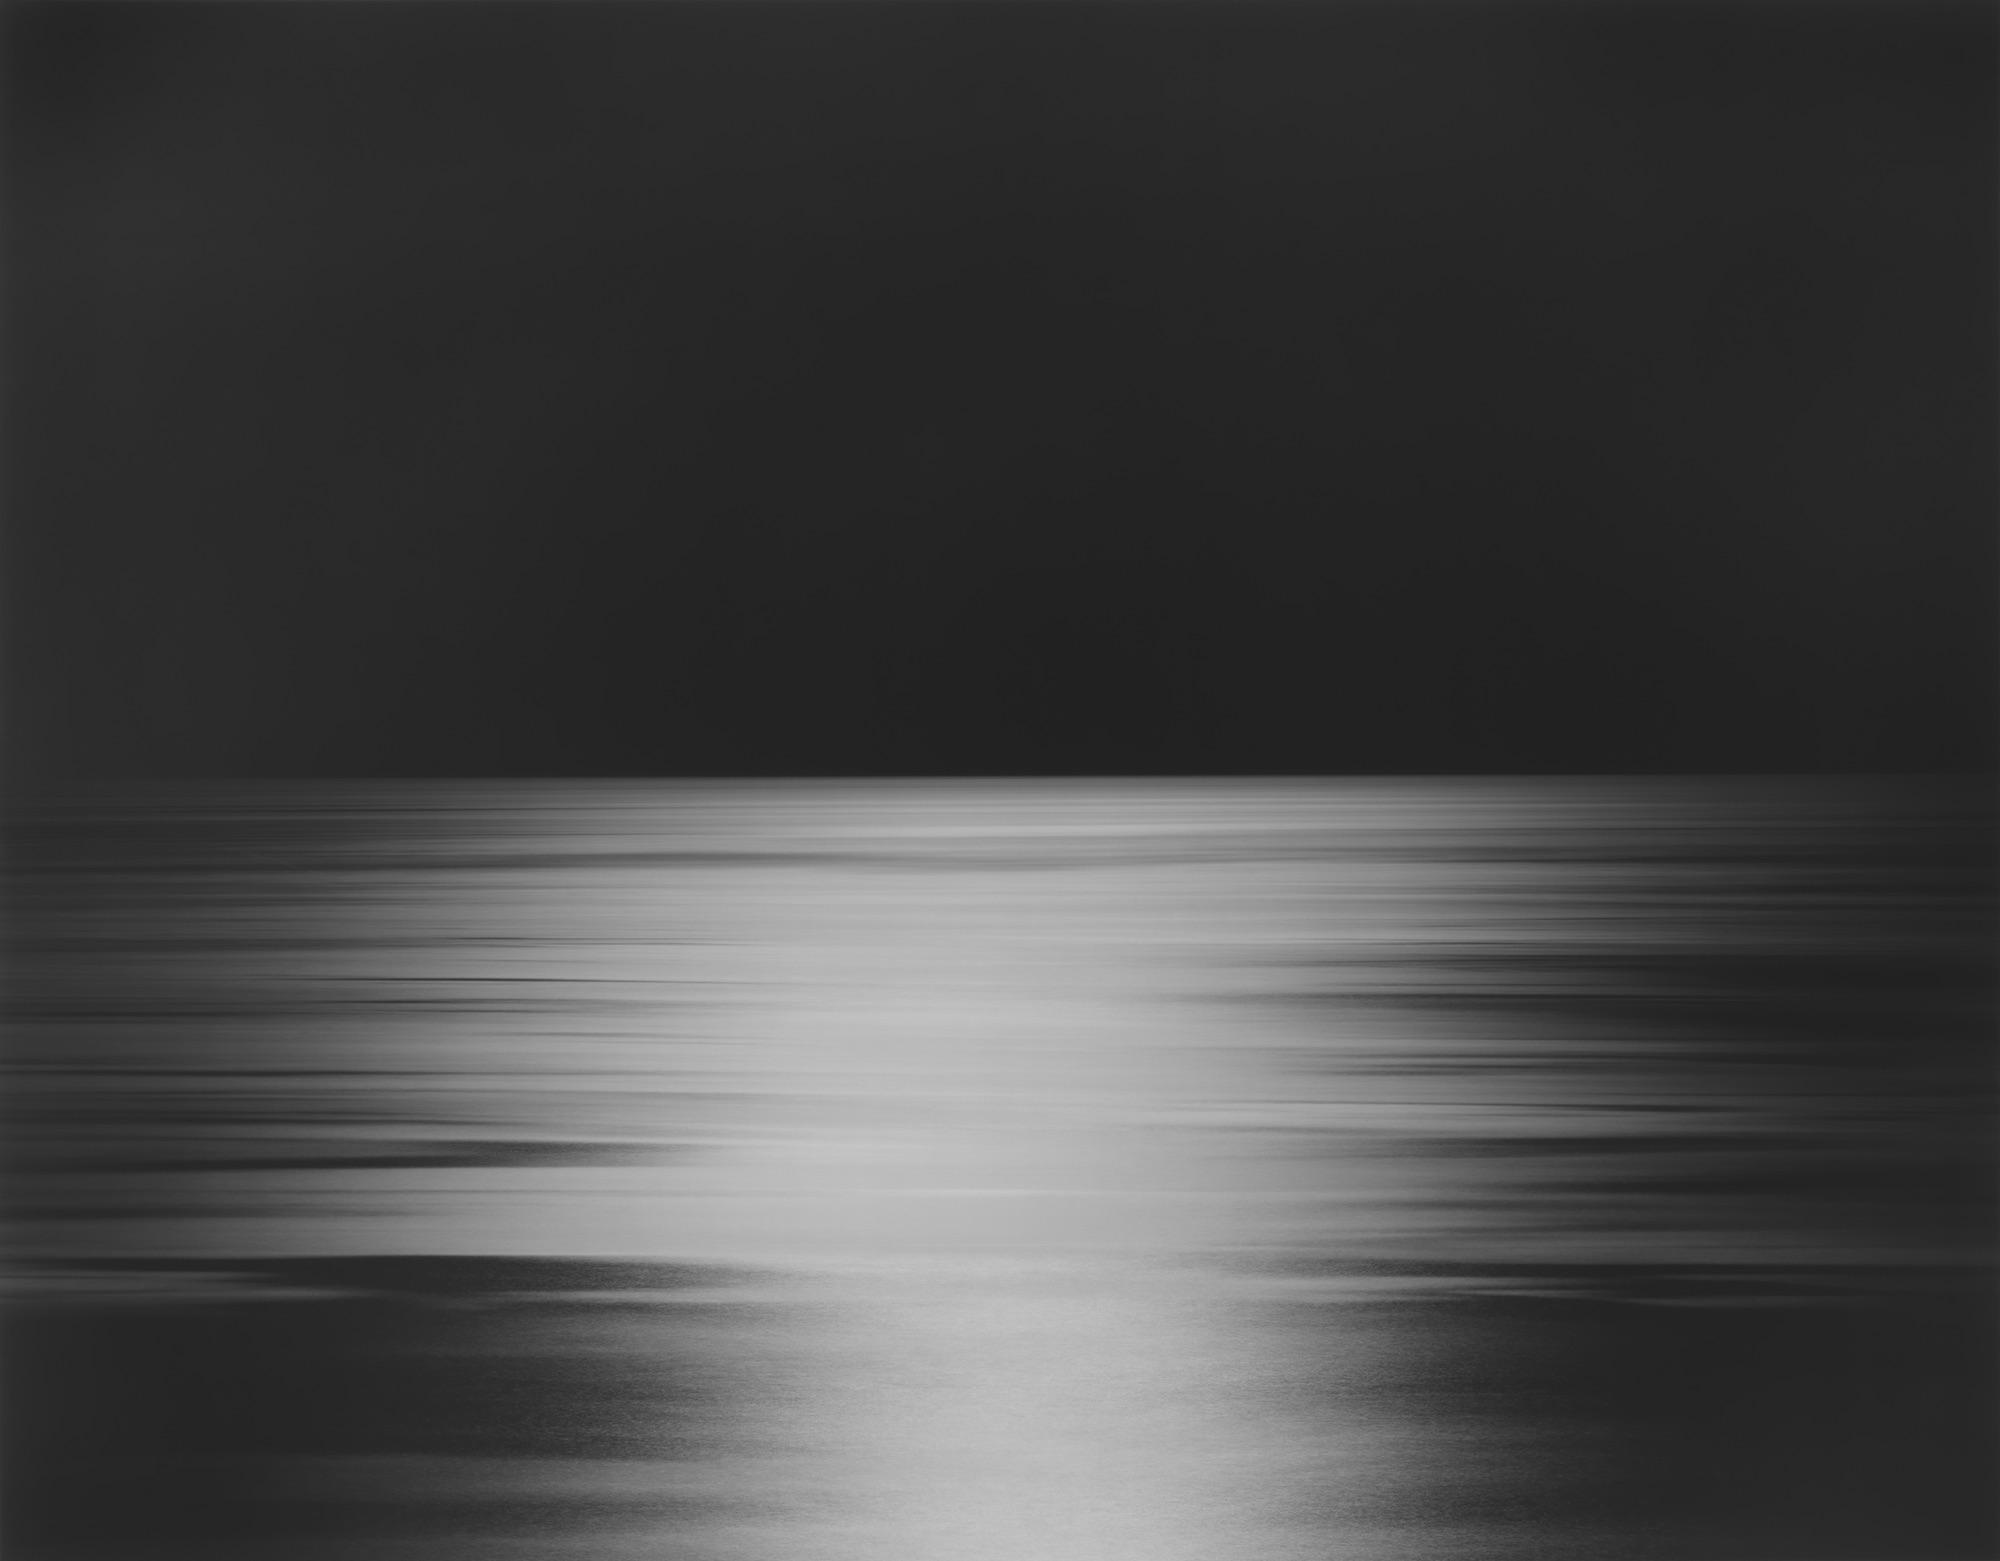 Horisho Sugimoto, N. Pacific Ocean, Ohkurosaki, 2013